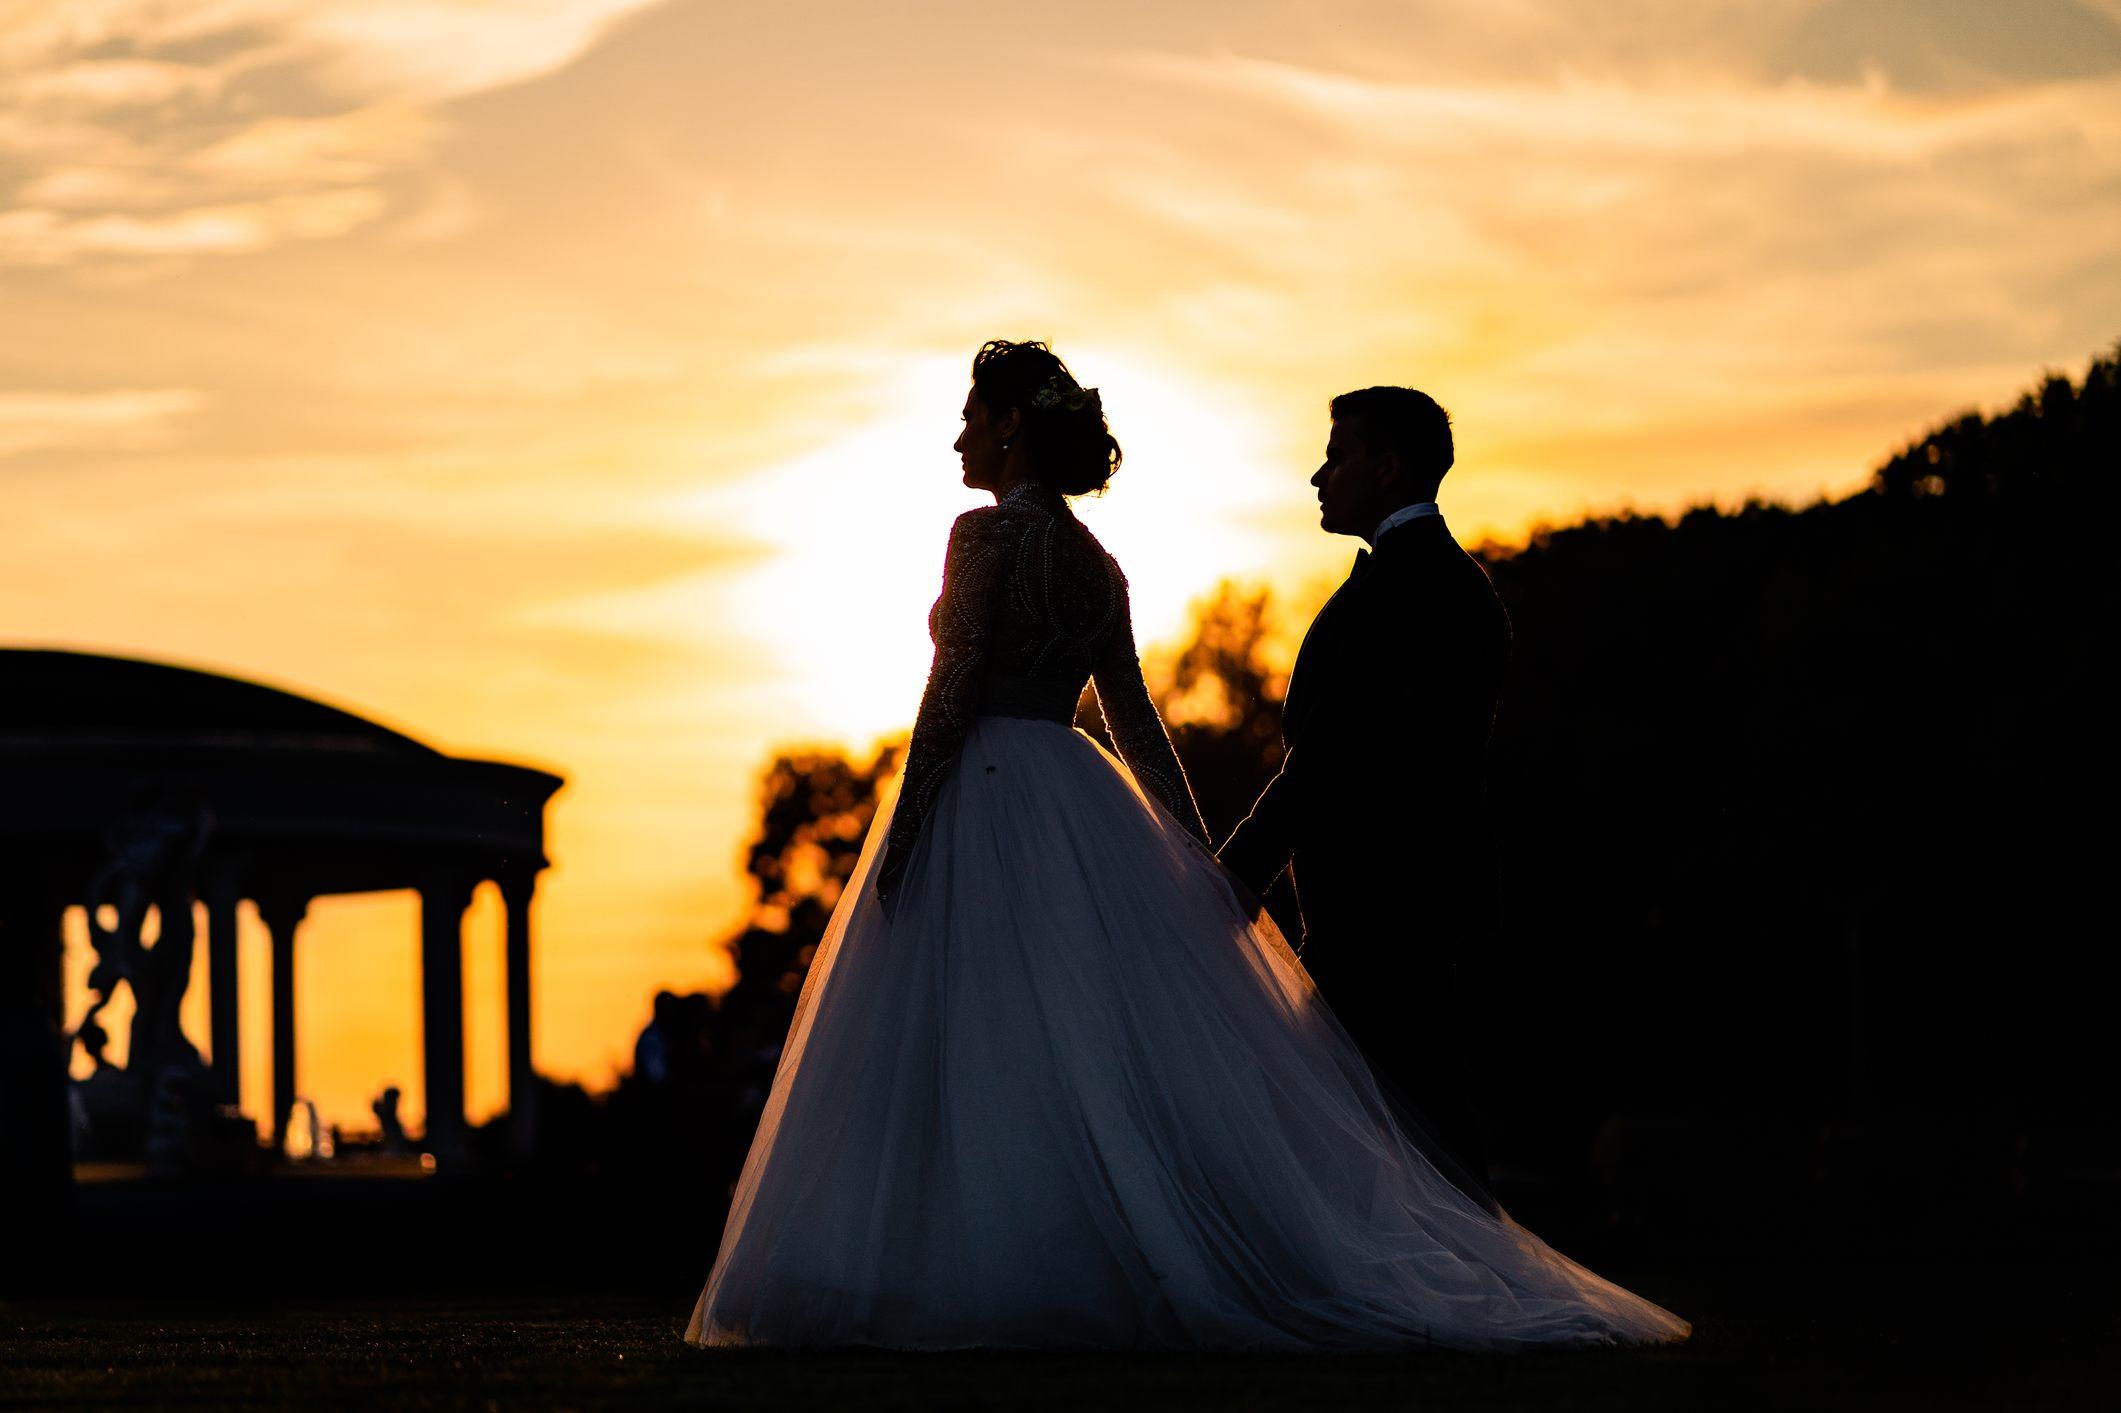 fotograf nunta bucuresti laurentiu nica  22 - Lorena & Matei | Fotografii nunta Bucuresti | Restaurant Domeniul cu Ciresi